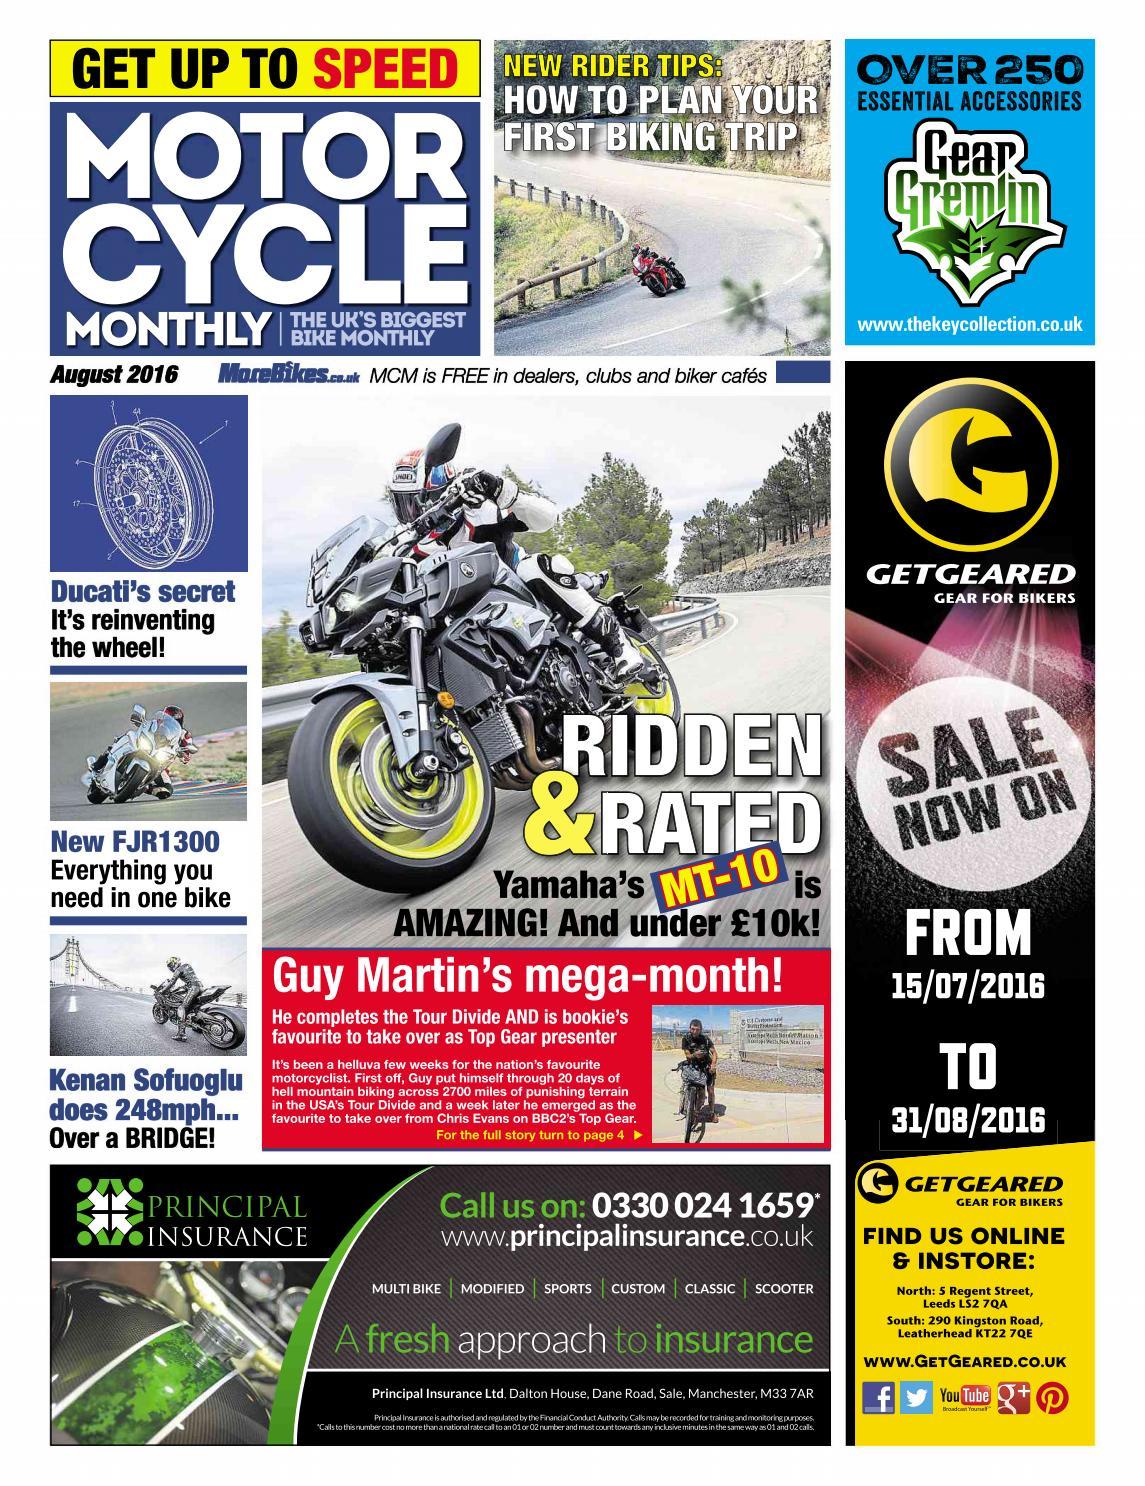 Catalog 5th Edition 1996 Kit Bikes Honda Suzuki Kawasaki Thumper Racing Inc